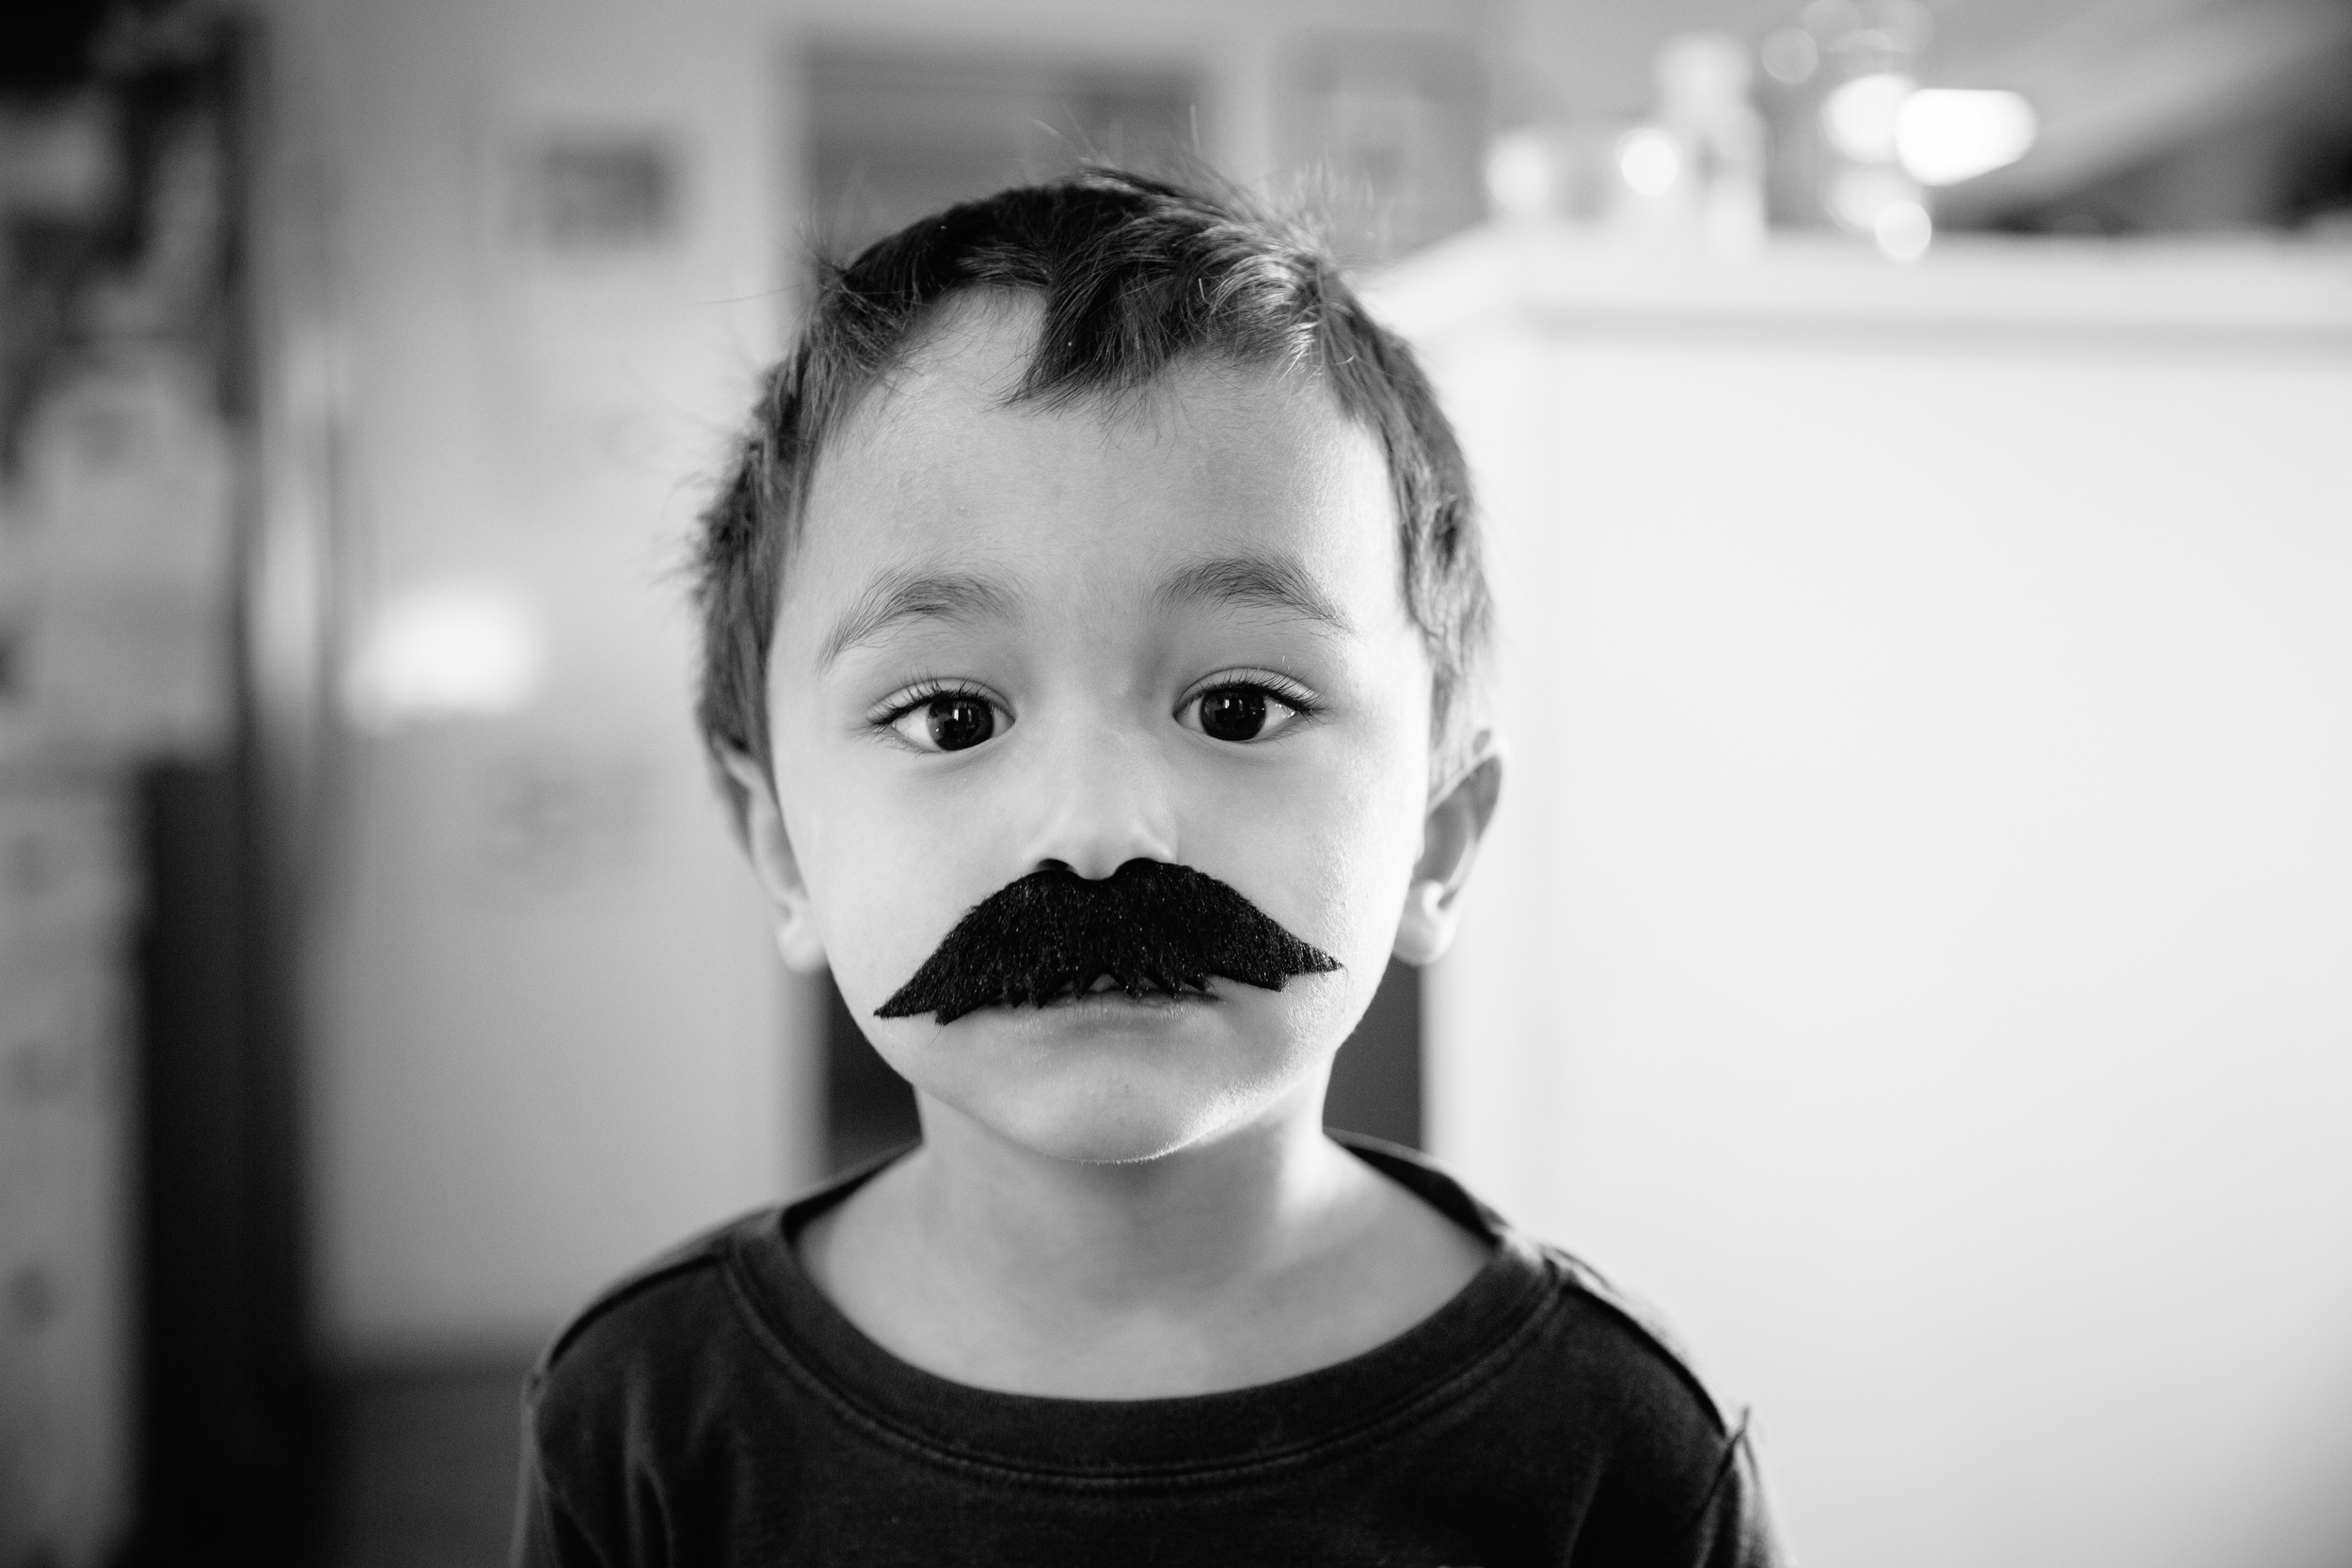 mustache-1.JPG